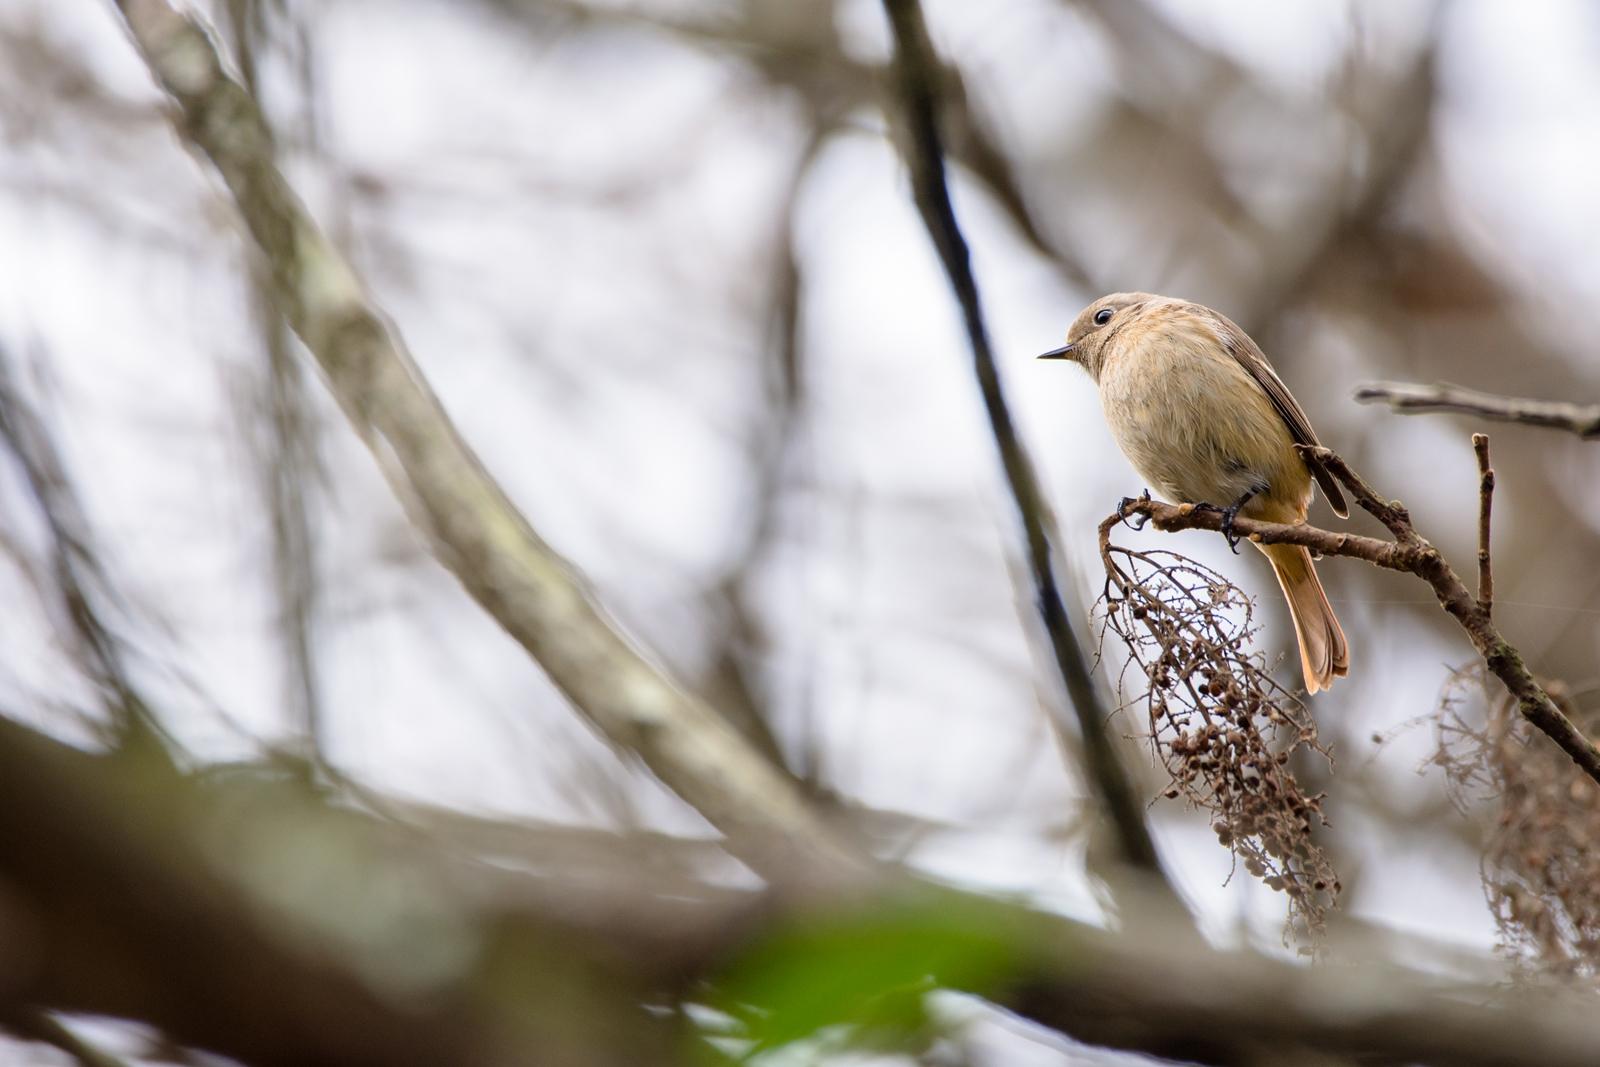 Photo: 「旅への備え」 / Preparing to journey.  長い道のりになるのかな 脳裏に浮かぶ故郷の景色 今はただ淡々と 旅に向けて  Daurian redstart. (ジョウビタキ)  Nikon D7200 SIGMA 150-600mm F5-6.3 DG OS HSM Contemporary  #birdphotography #birds #kawaii #小鳥 #nikon #sigma #小鳥グラファー  ( http://takafumiooshio.com/archives/1255 )